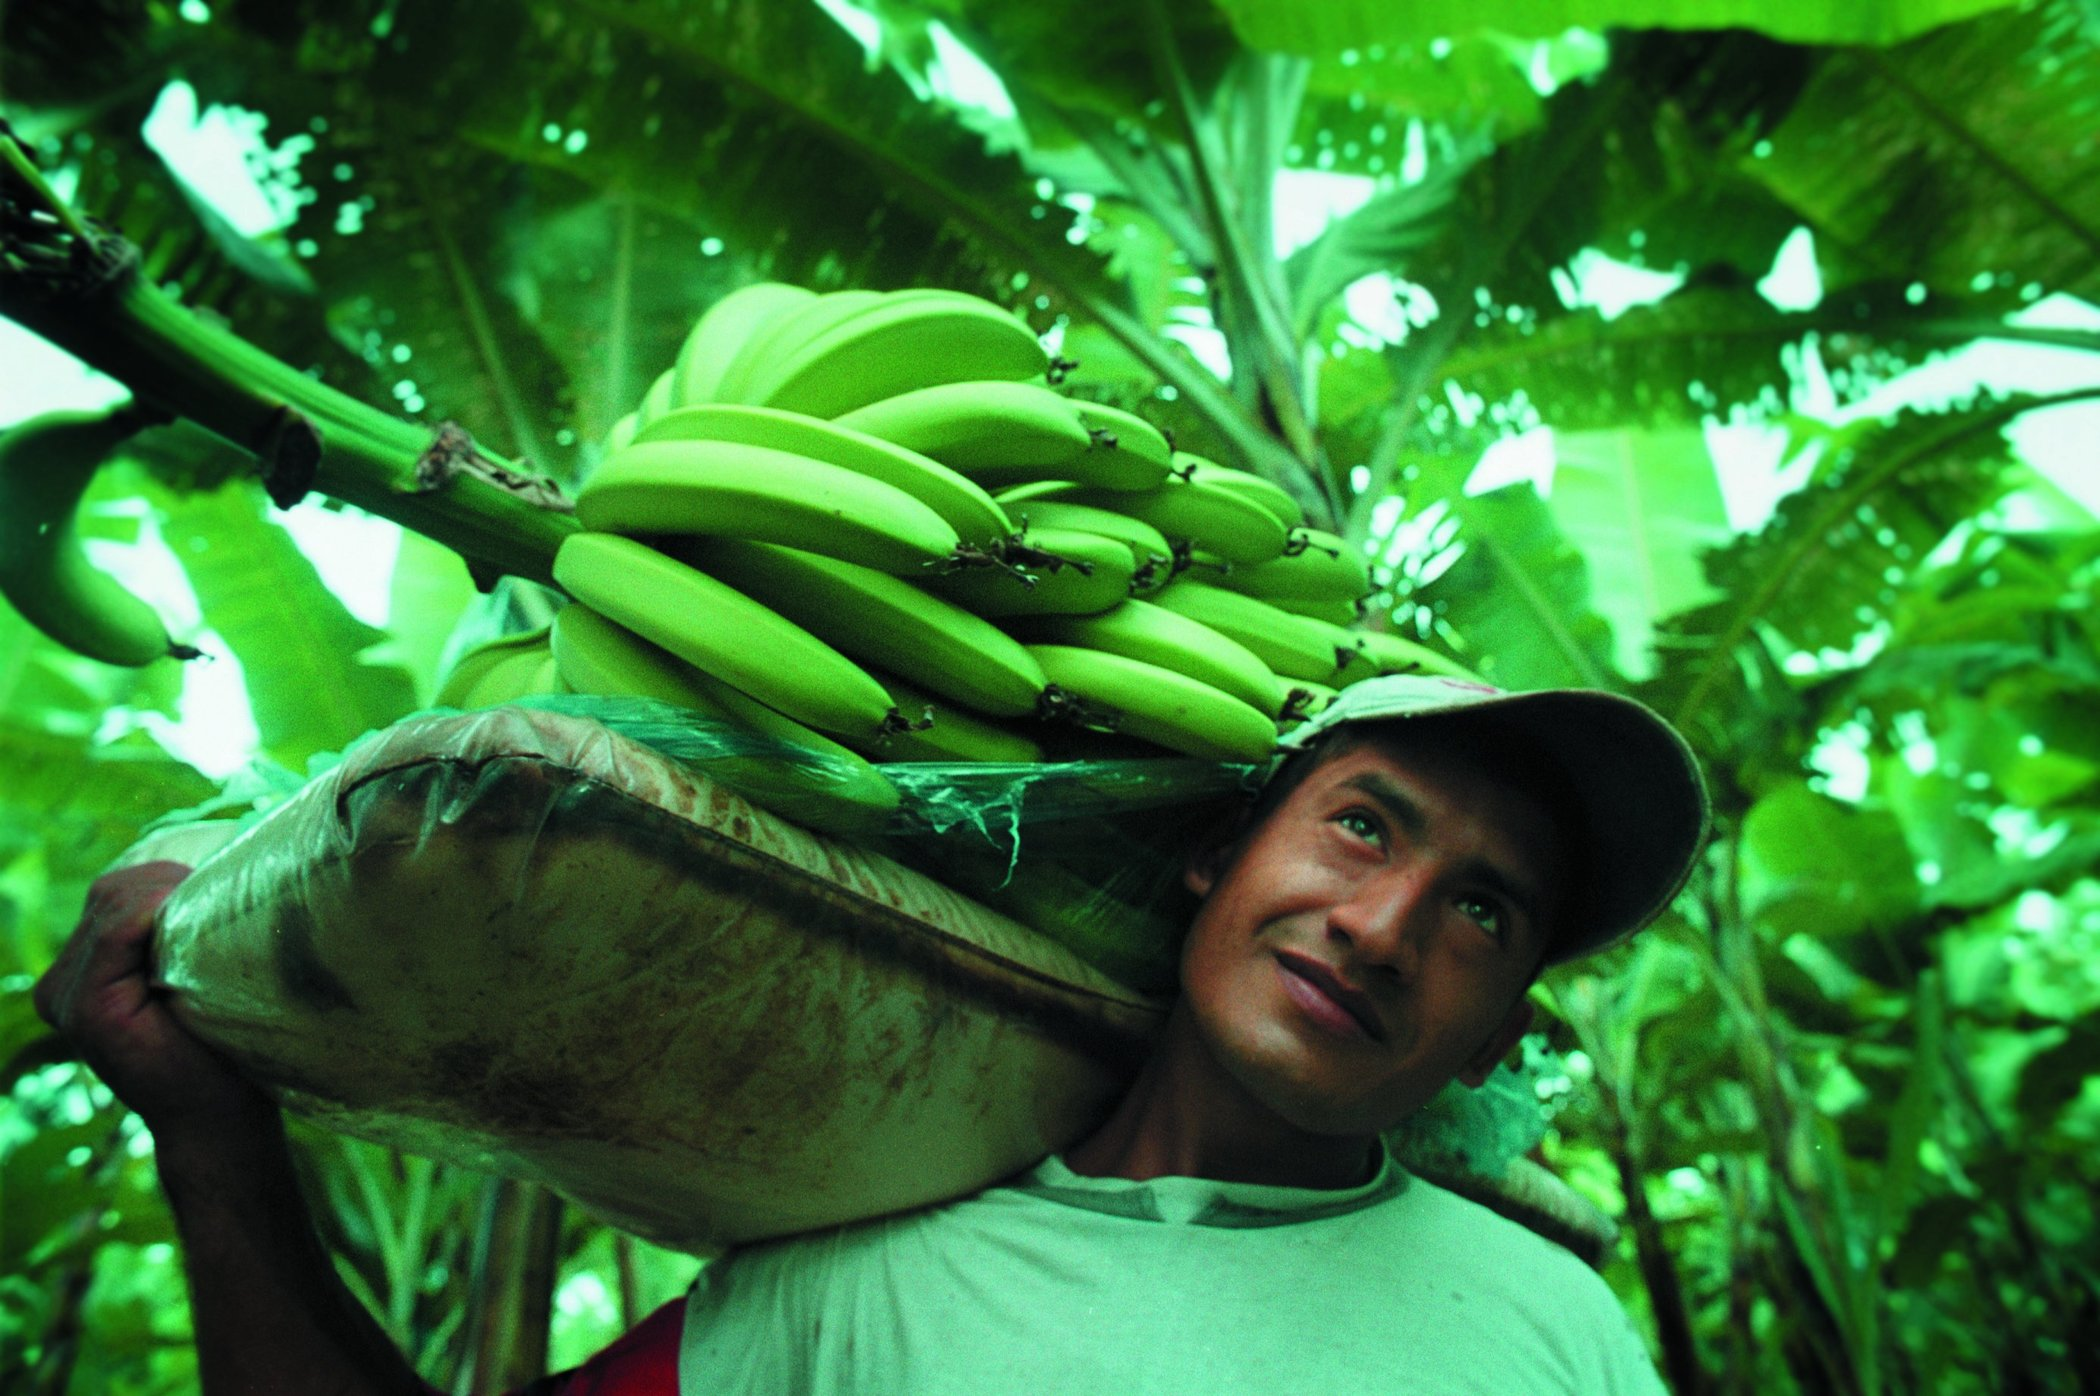 harvesting banana Banana production guide a) importance of banana the banana is an important economic resource for rural farmers in uganda properly staked banana f) harvesting.